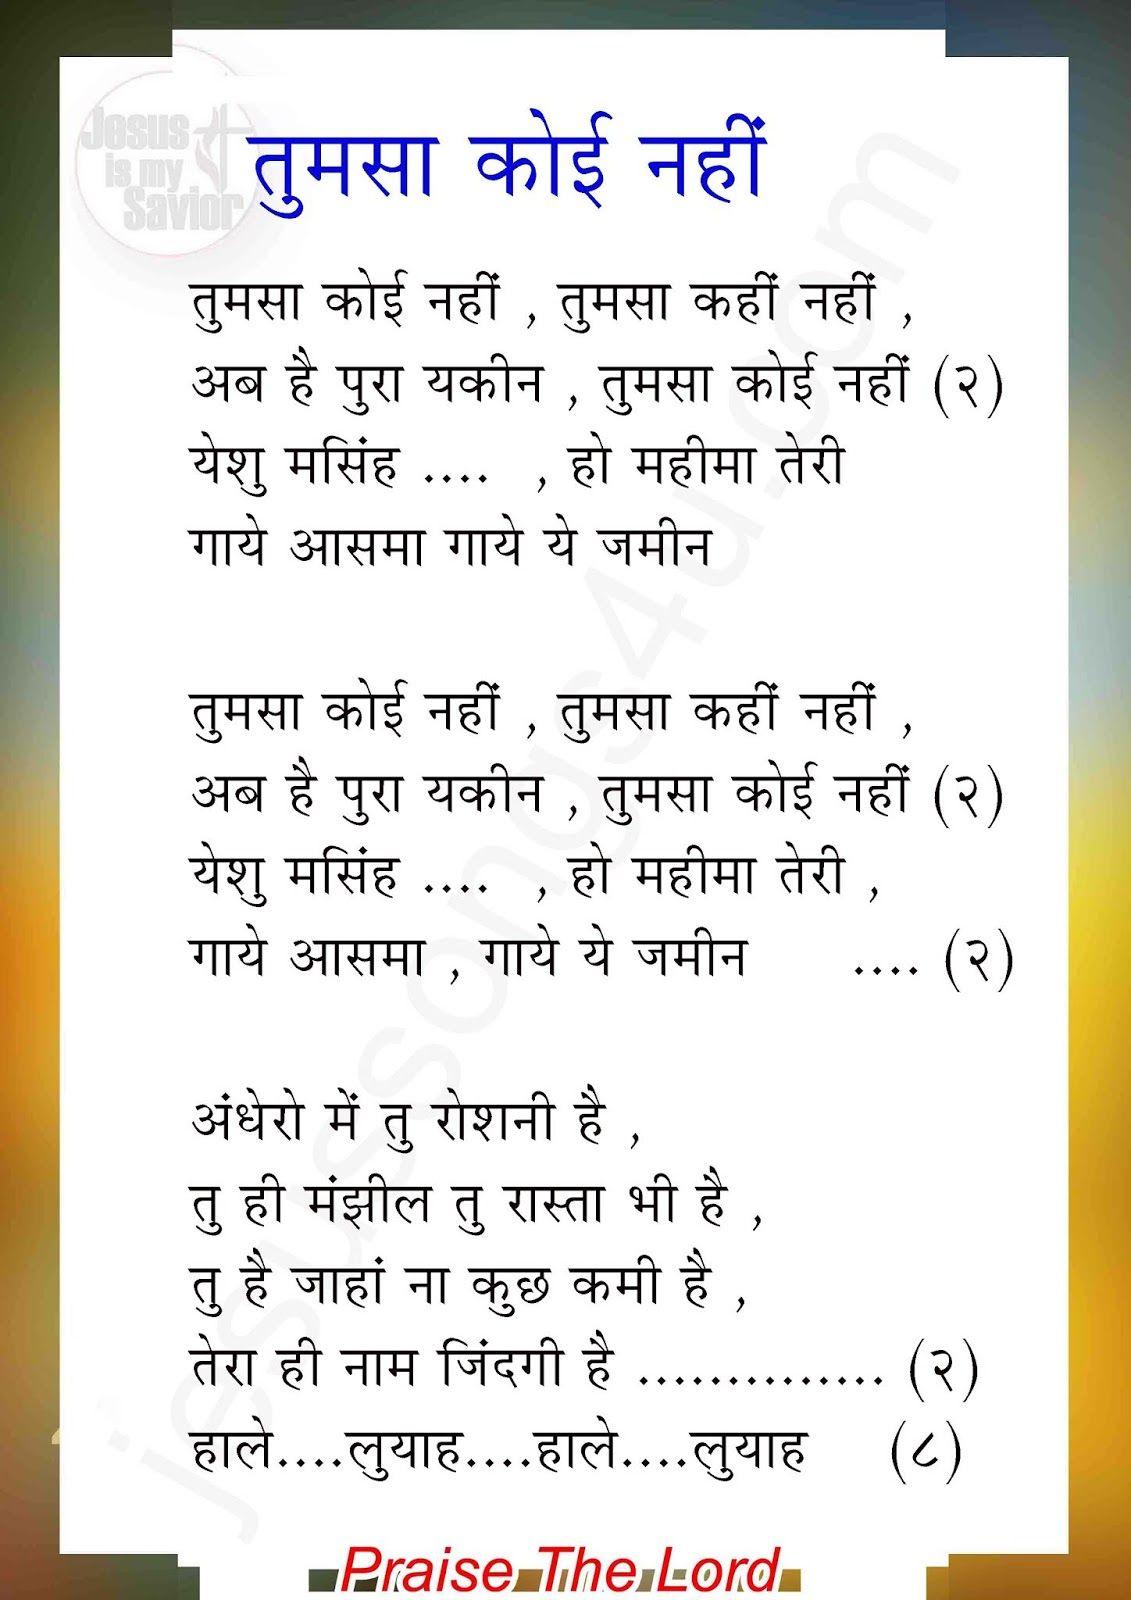 Pin On Rasik Dodka Lovely jesus song in hindi. pin on rasik dodka